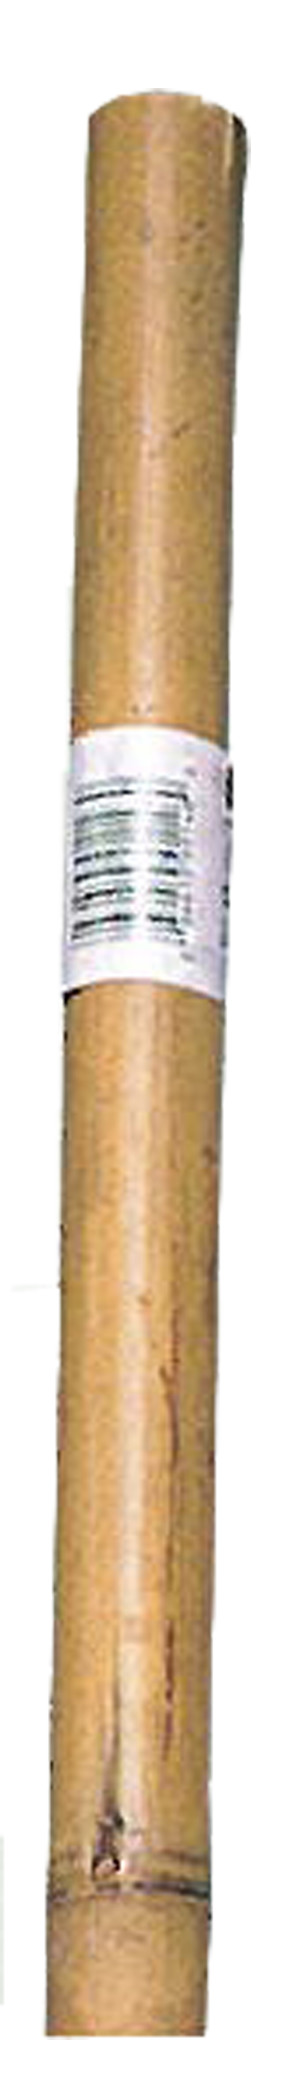 Bond Super Bamboo Pole Brown 25ea/6Ftx1 in